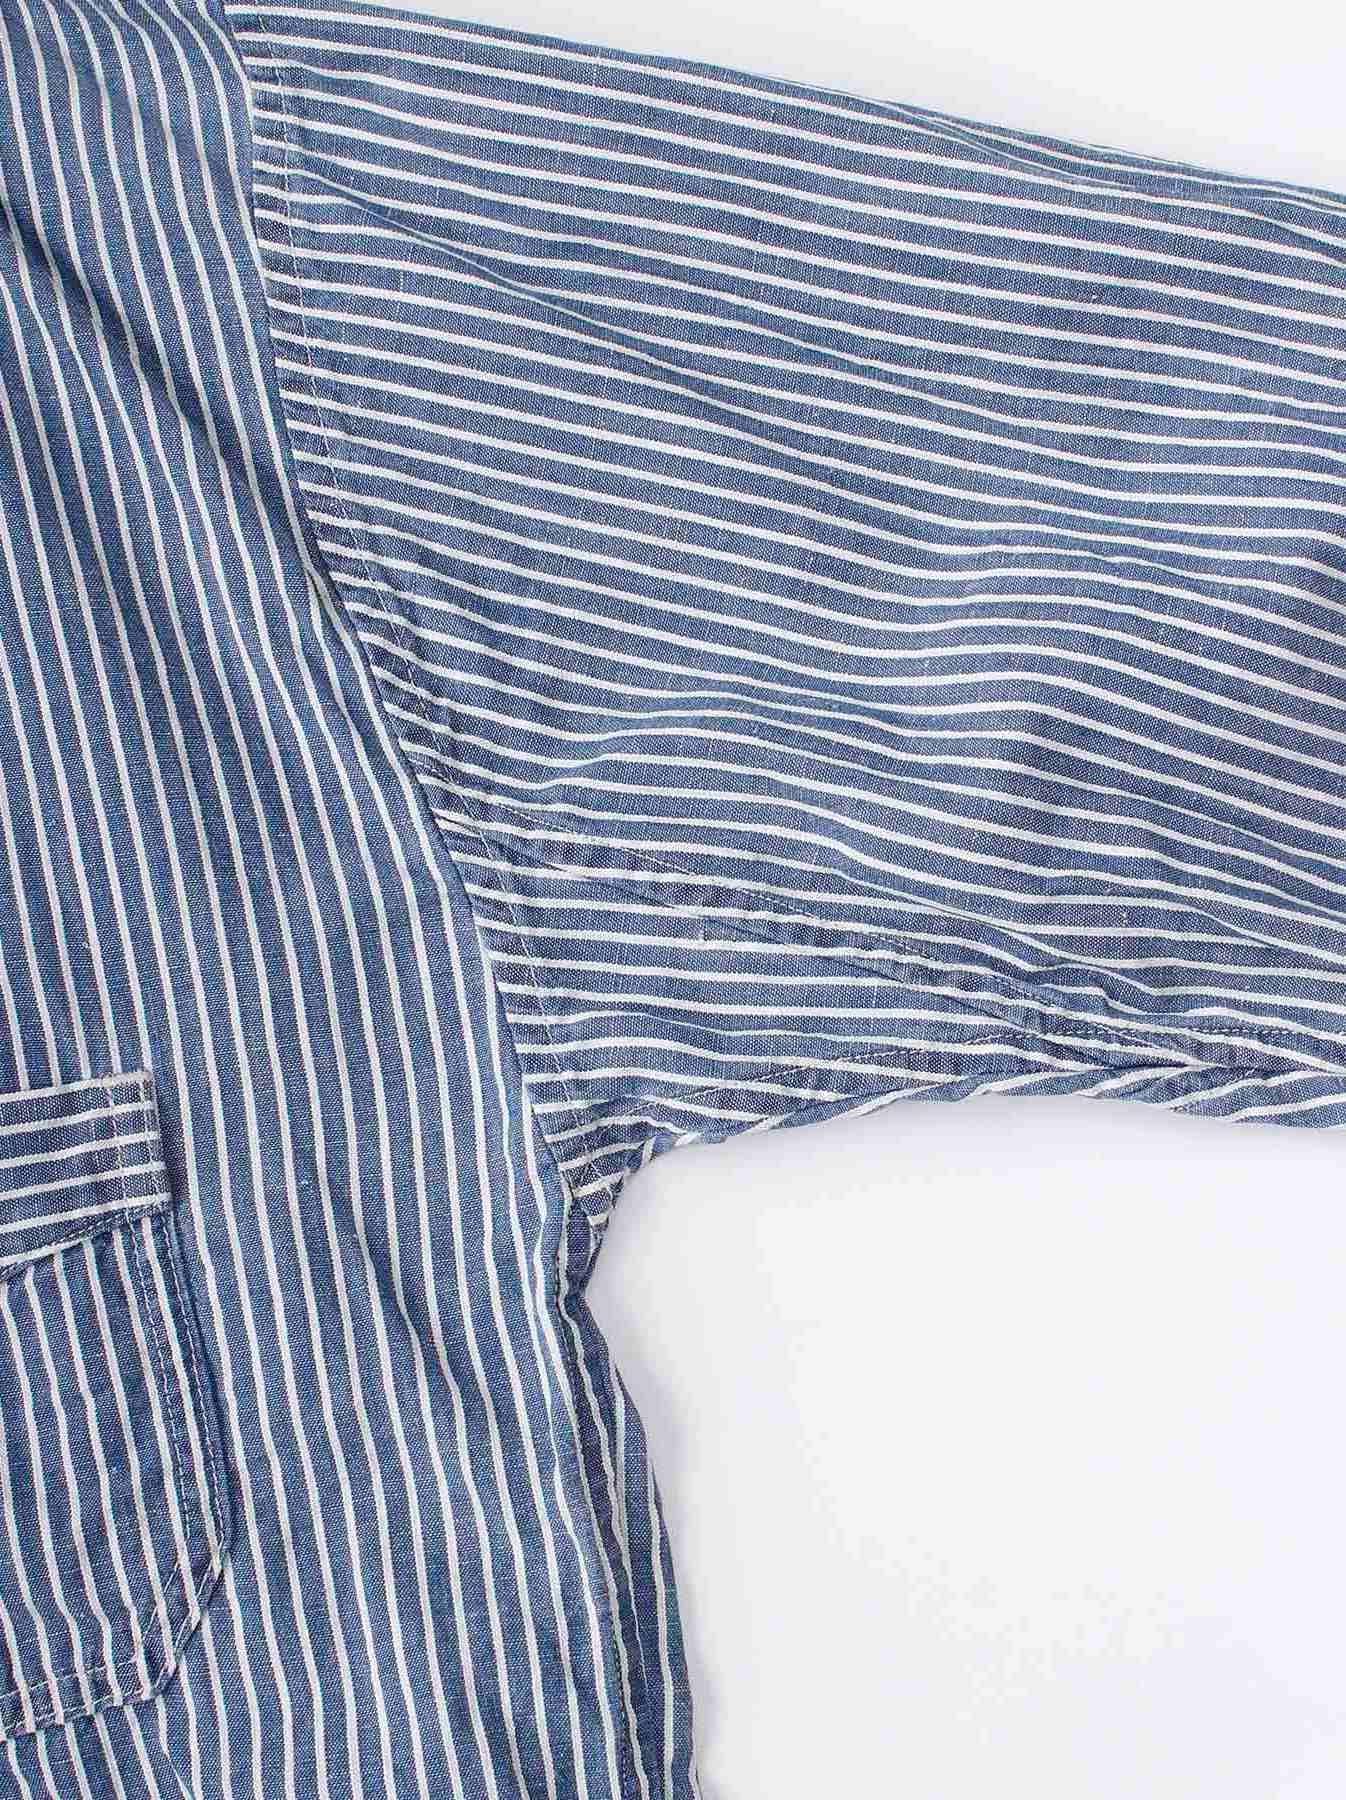 WH Cotton Linen Hickory Umahiko Pullover Shirt-8